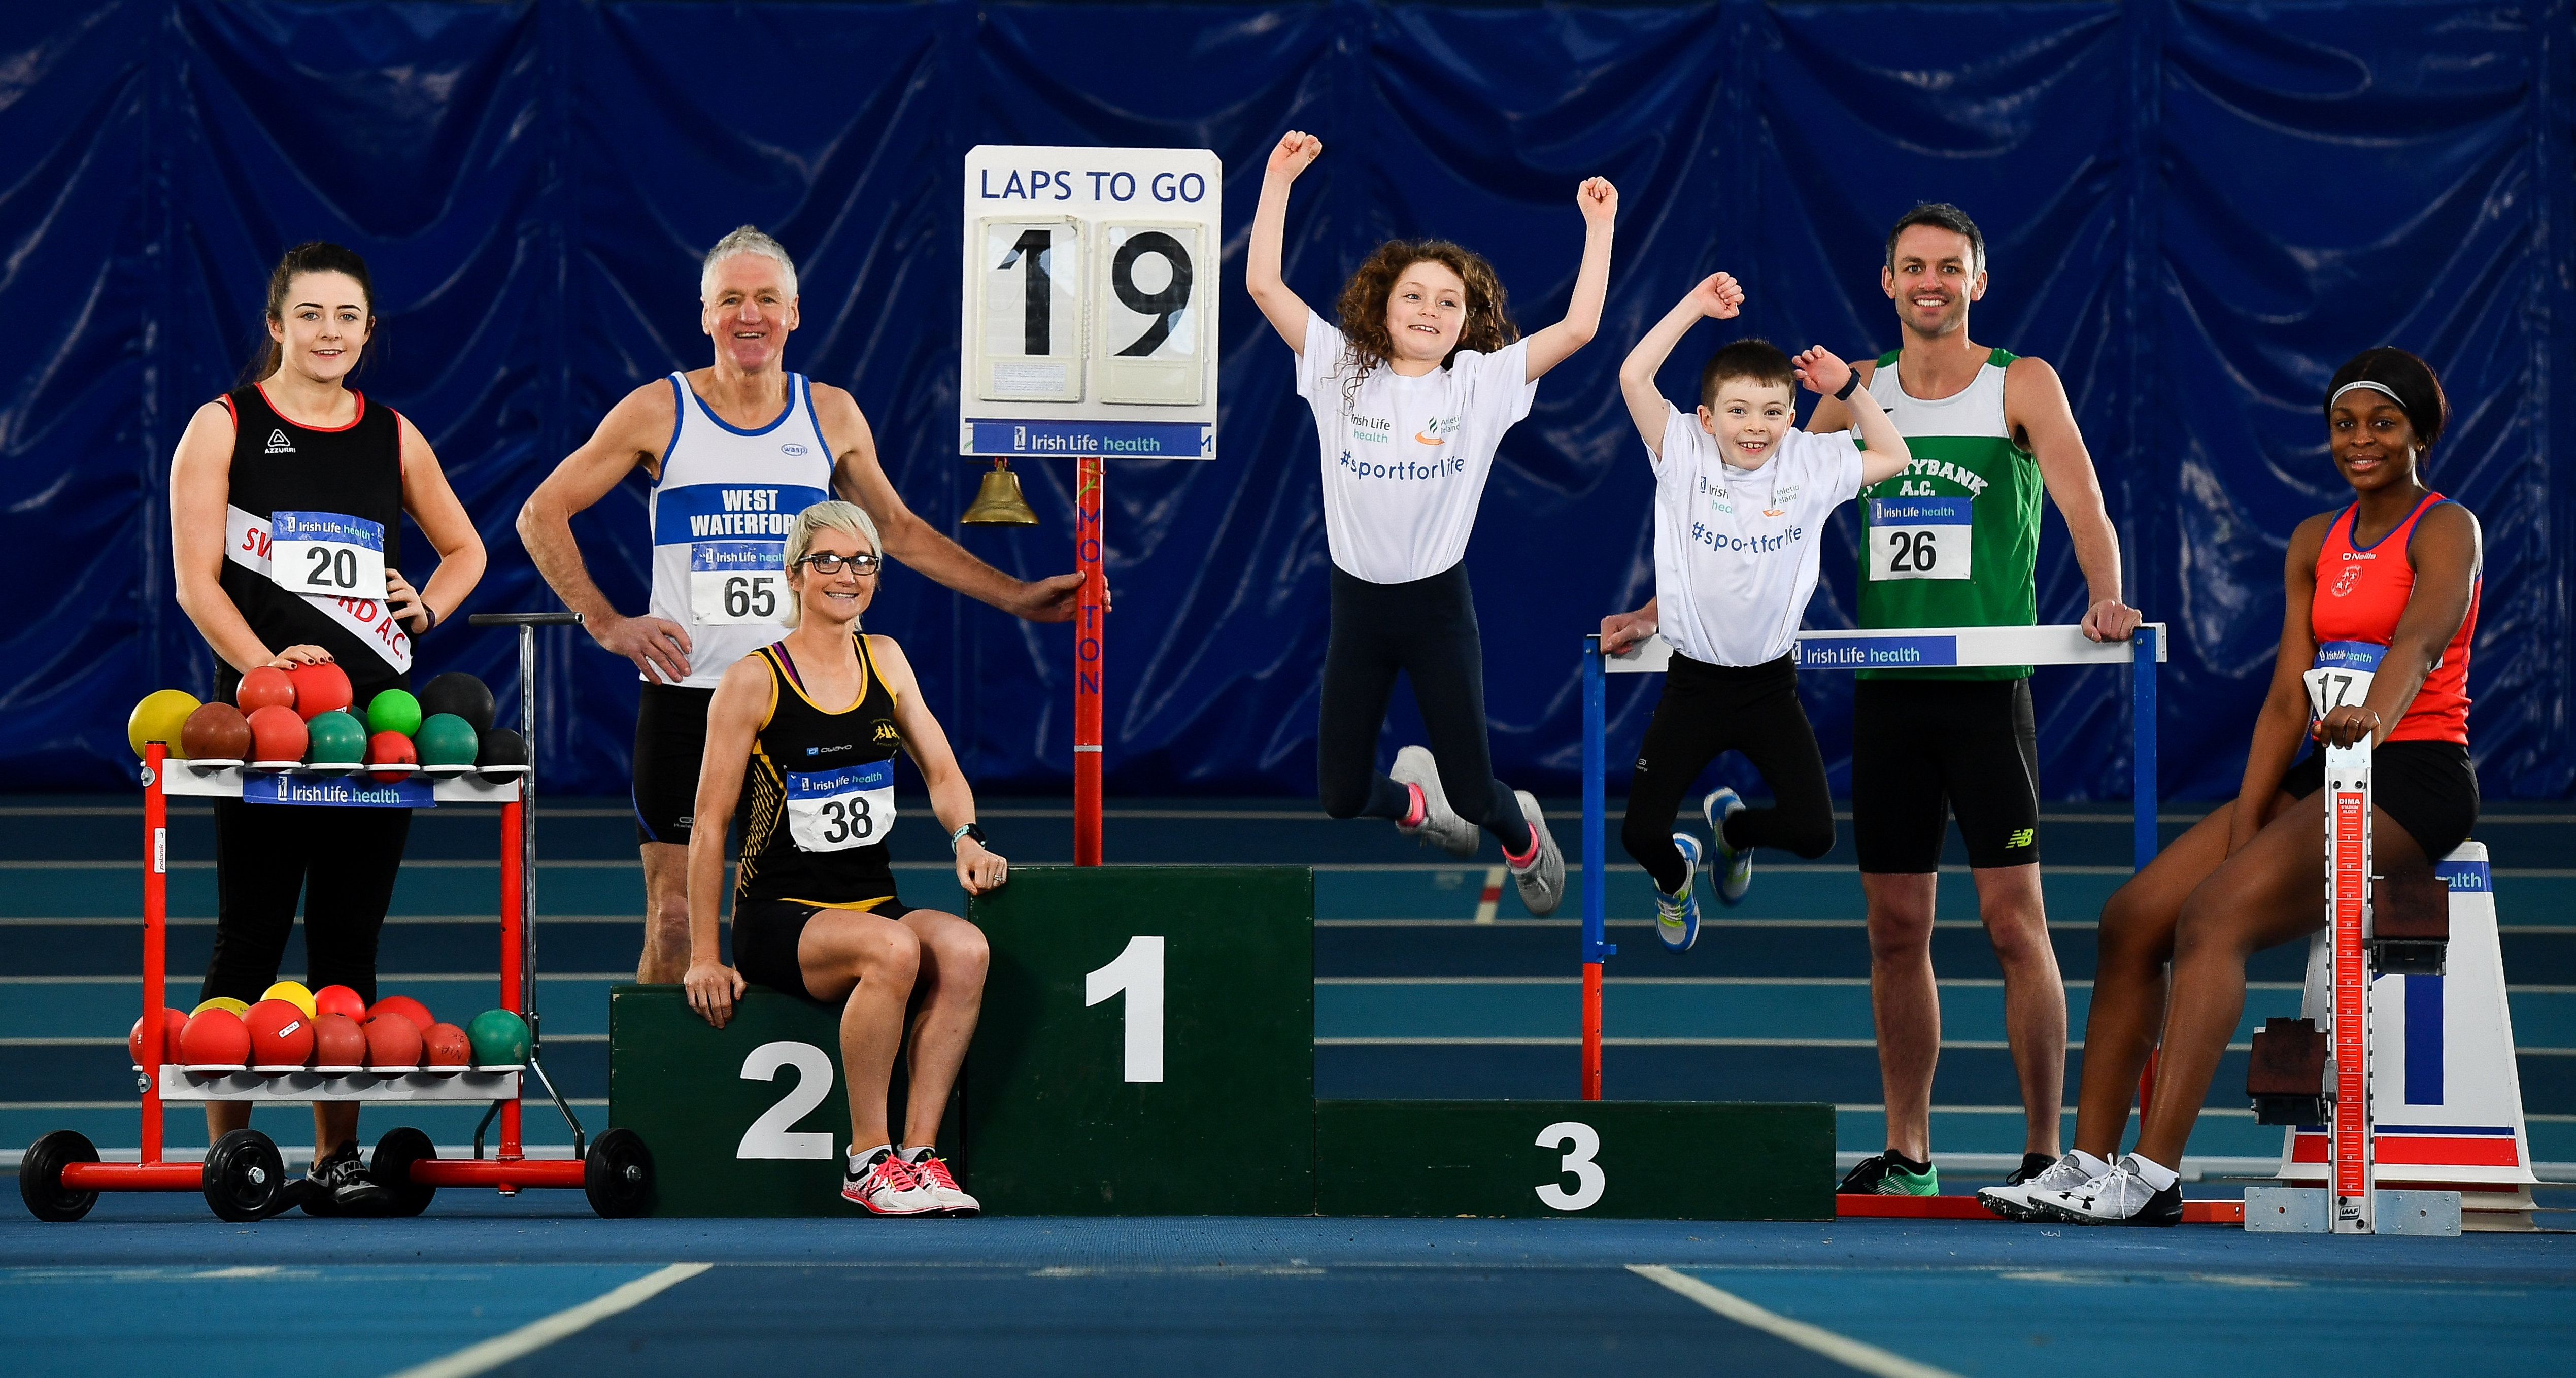 Irish Life Health backs Athletics delivering Health & Lifelong Activity